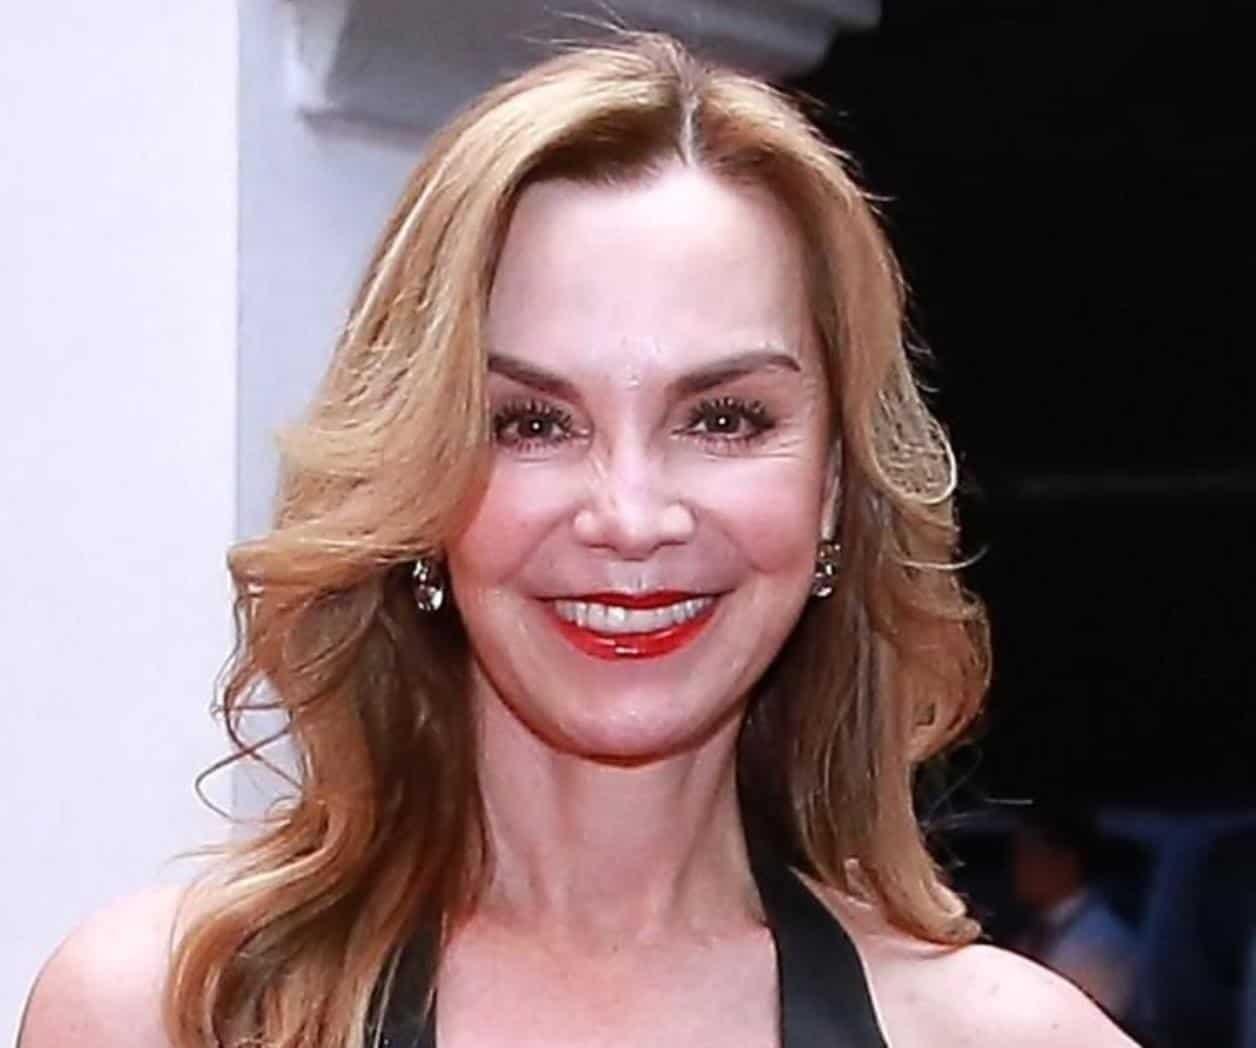 Gabriela Goldsmith precandidata de Morena